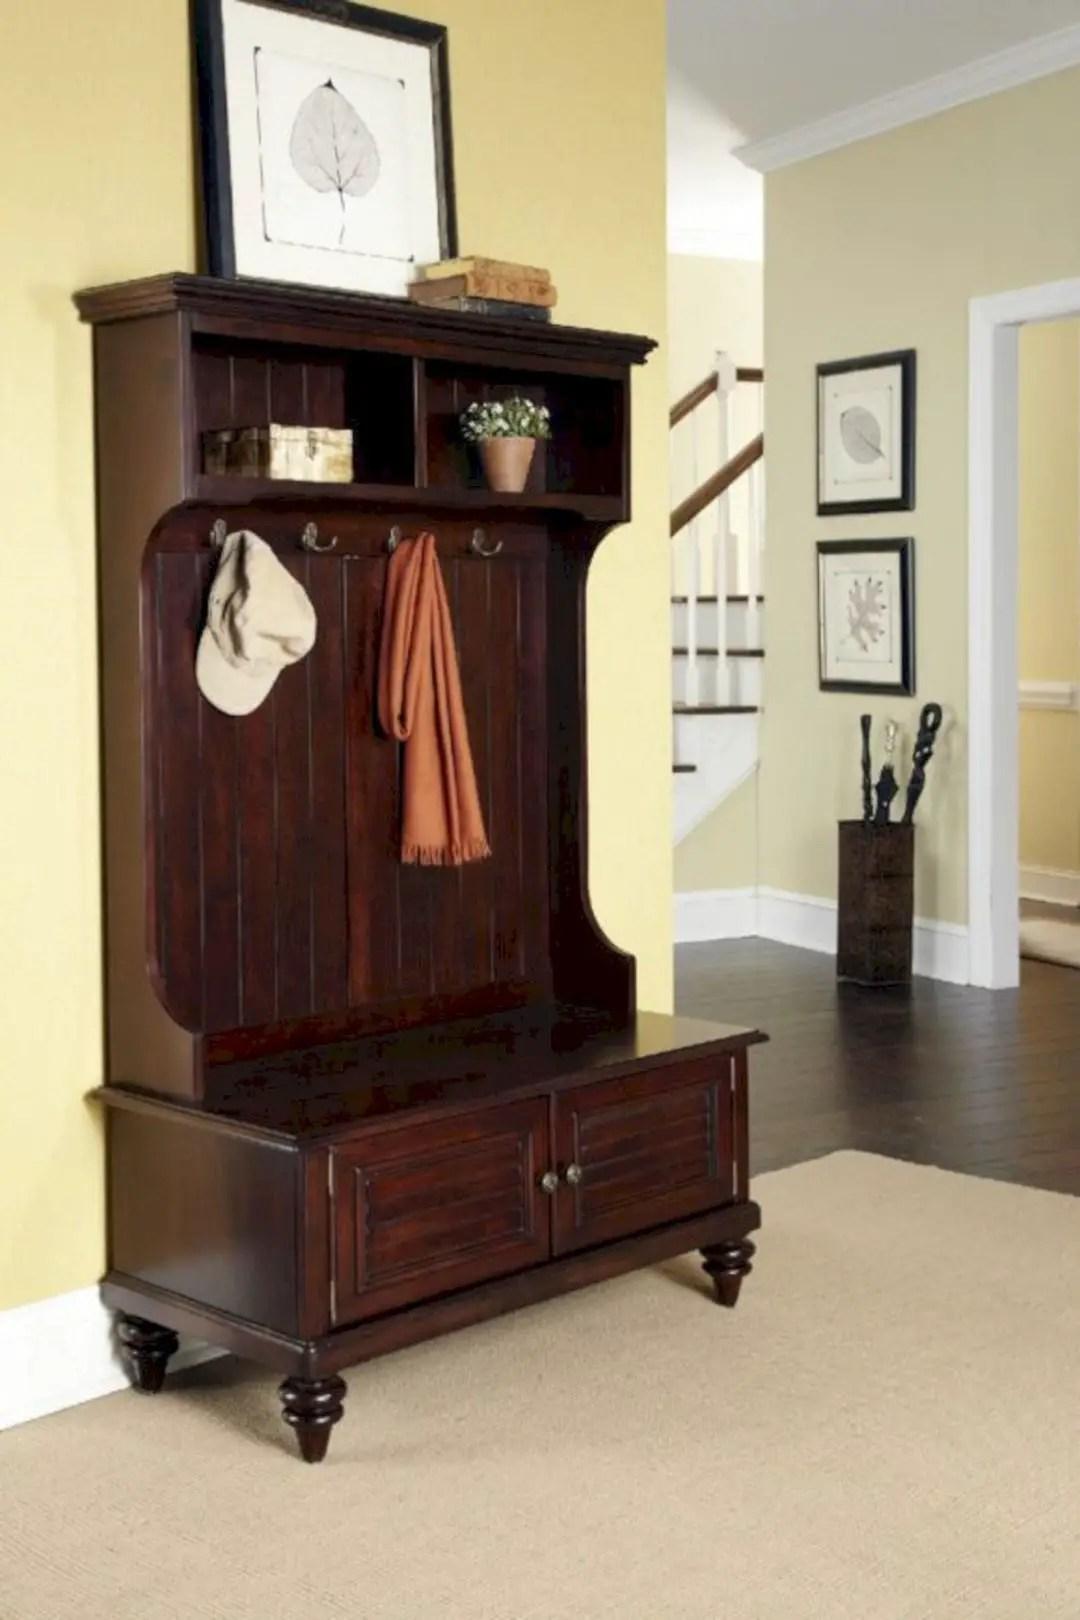 Hall-tree-storage-bench-furniture-1